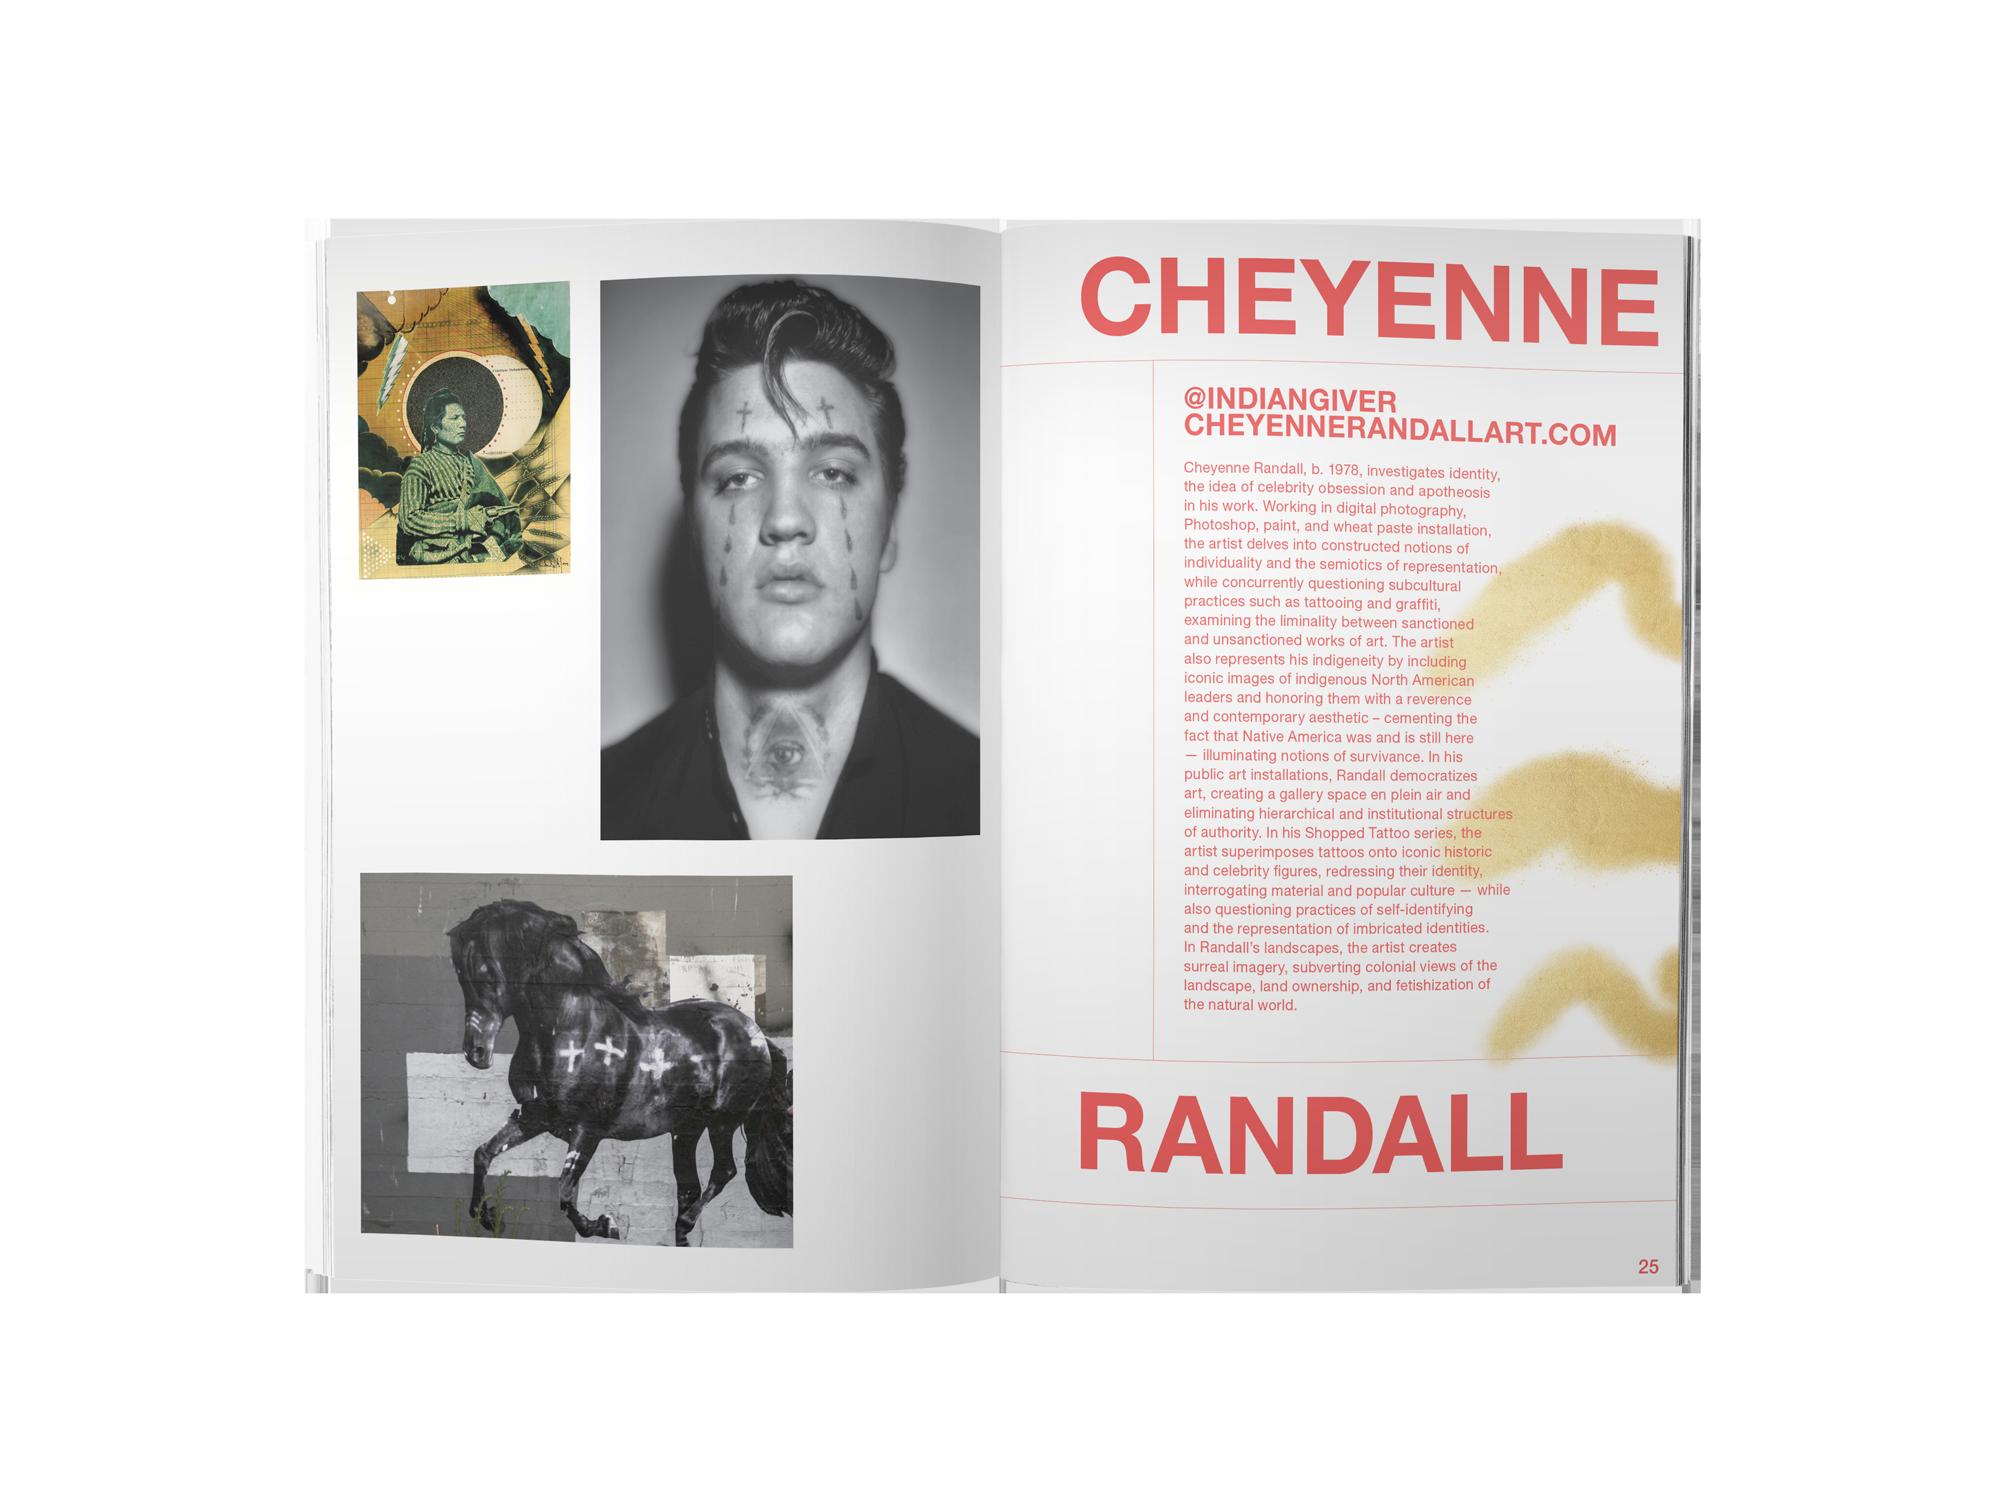 cheyenne-randall.png